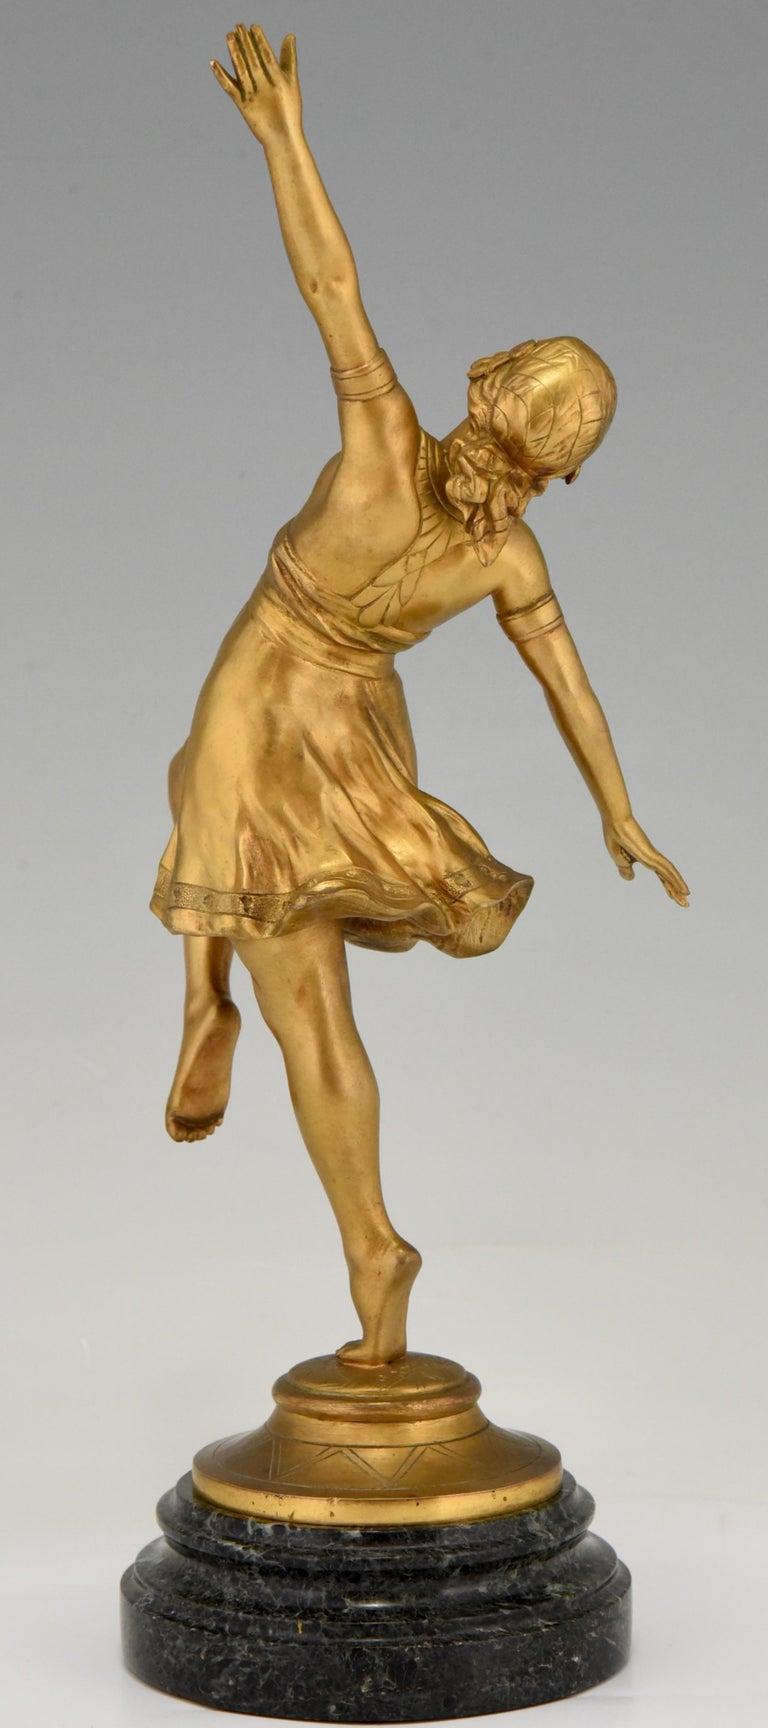 Art Nouveau Bronze Sculpture Oriental Dancer Jean Garnier, France, 1900 In Good Condition For Sale In Antwerp, BE